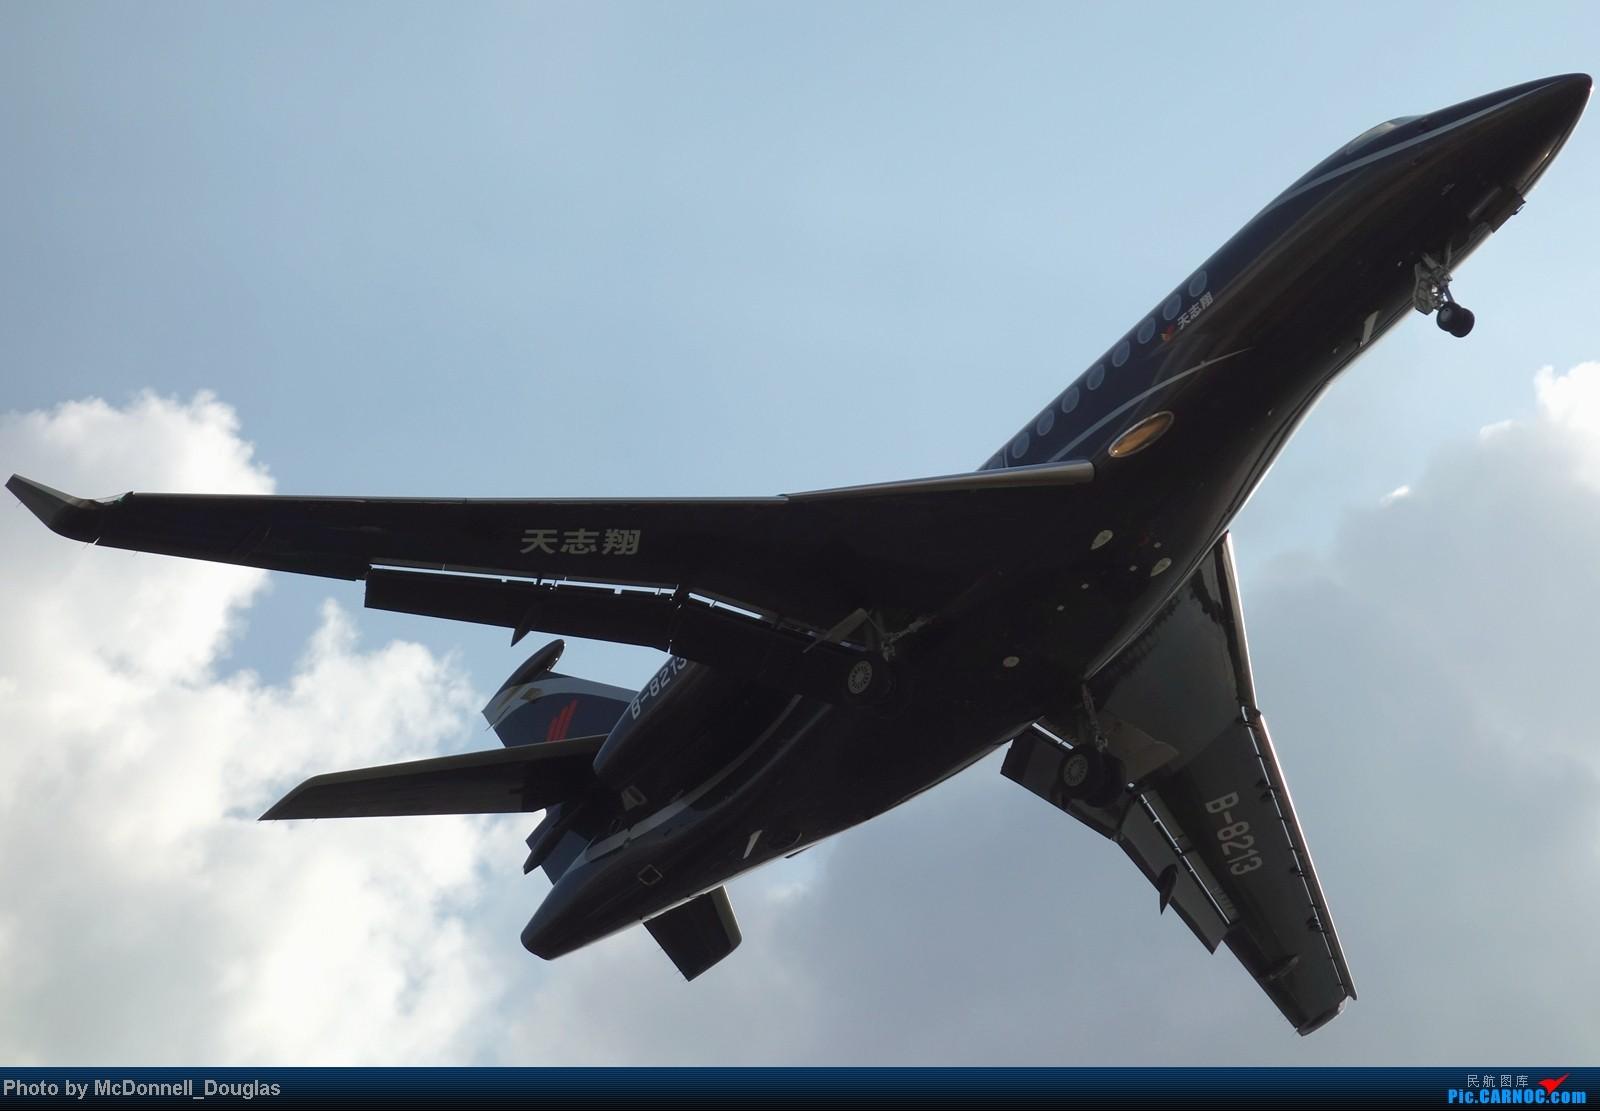 Re:[原创]【上海飞友会】ZSSS杂图一组 DASSAULT FALCON 7X B-8213 中国上海虹桥机场